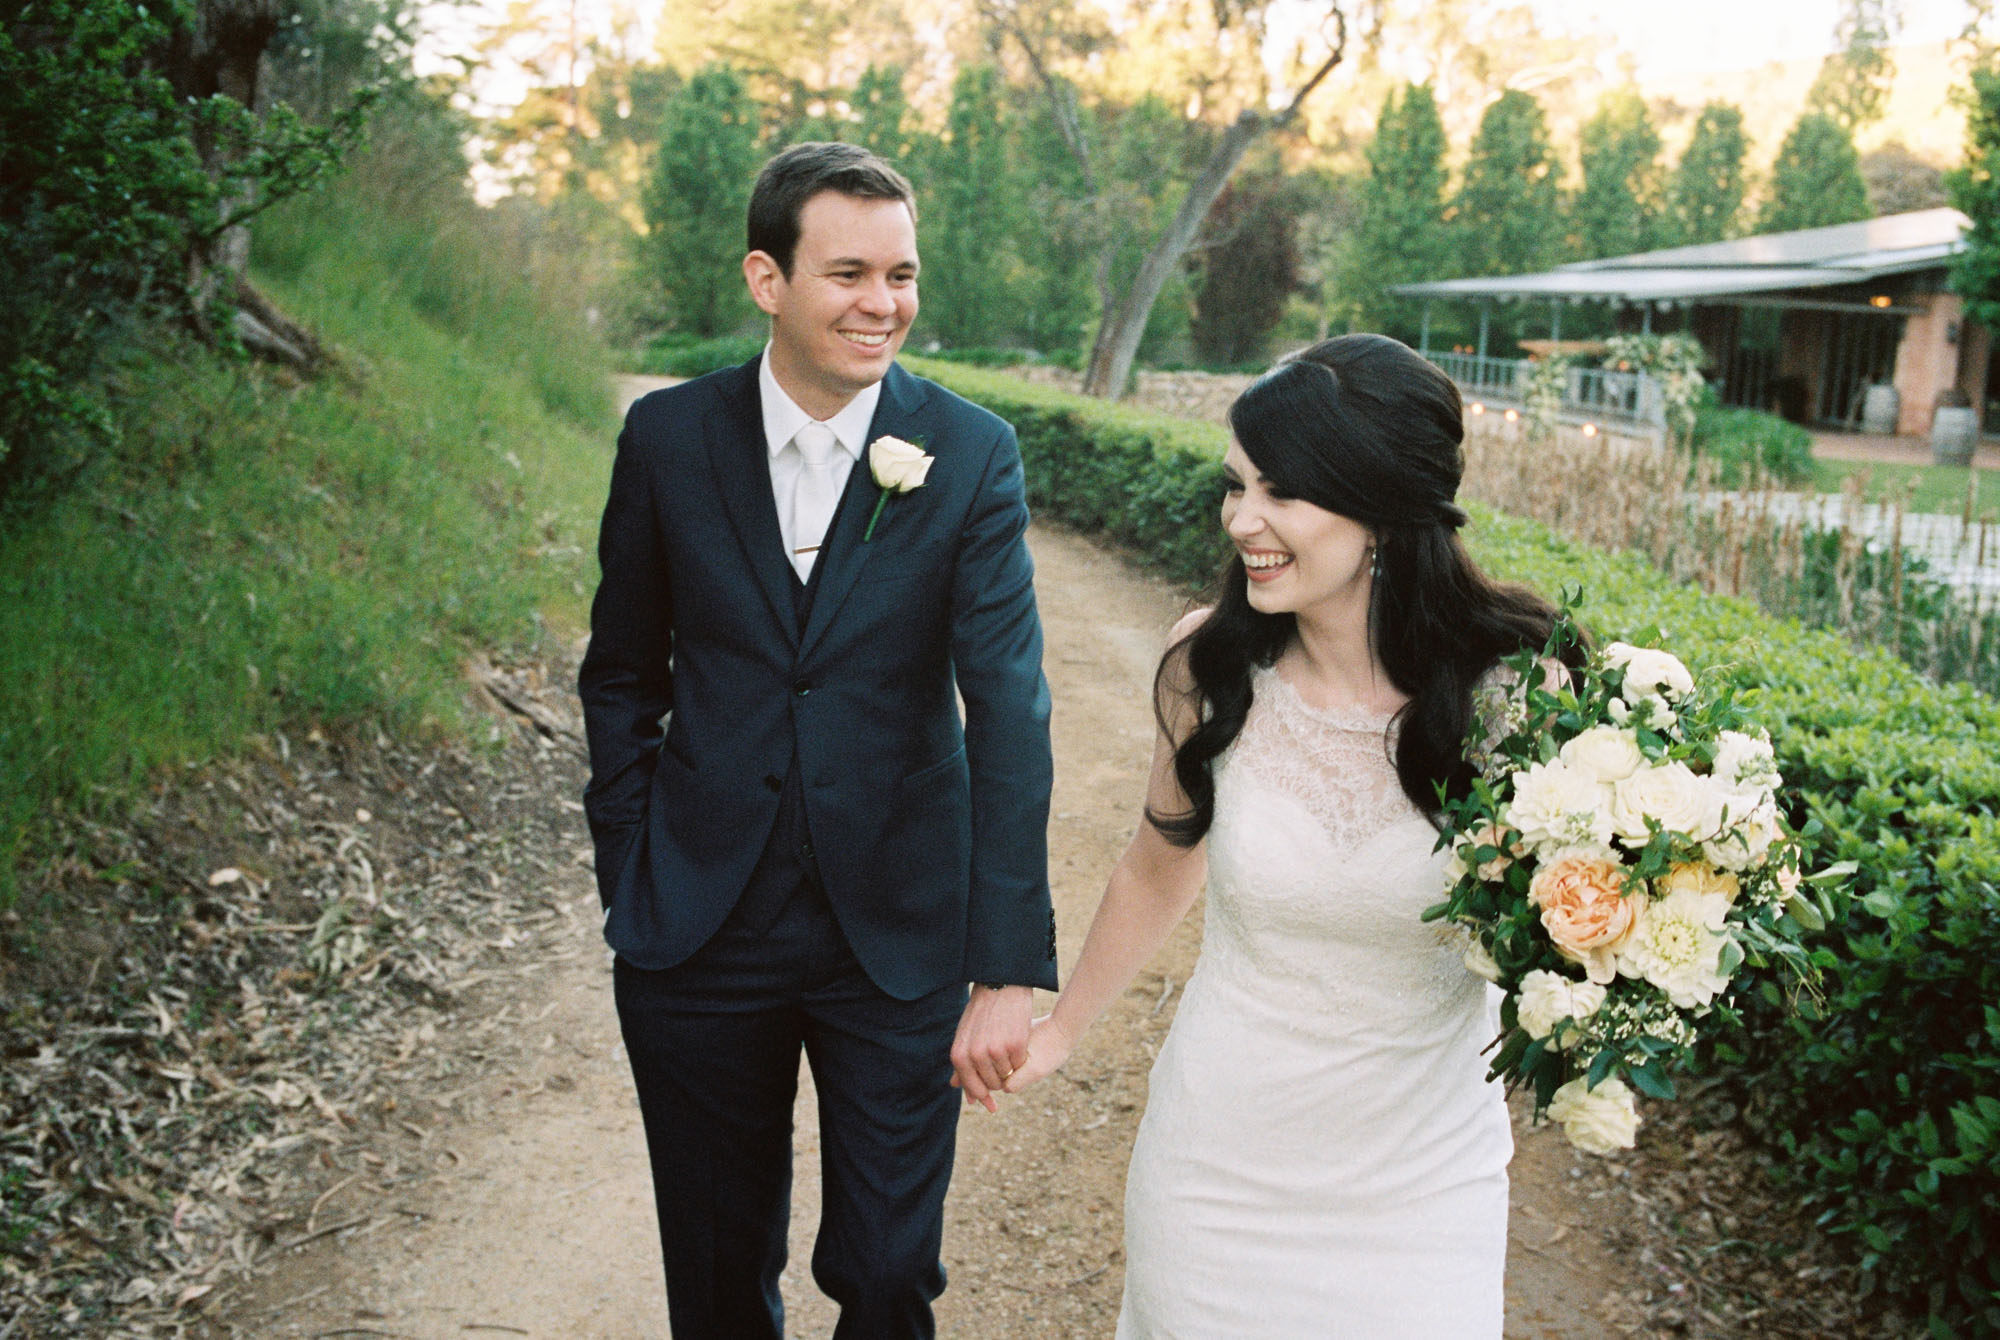 Glen-Ewin-Estate-wedding-photography-071.jpg